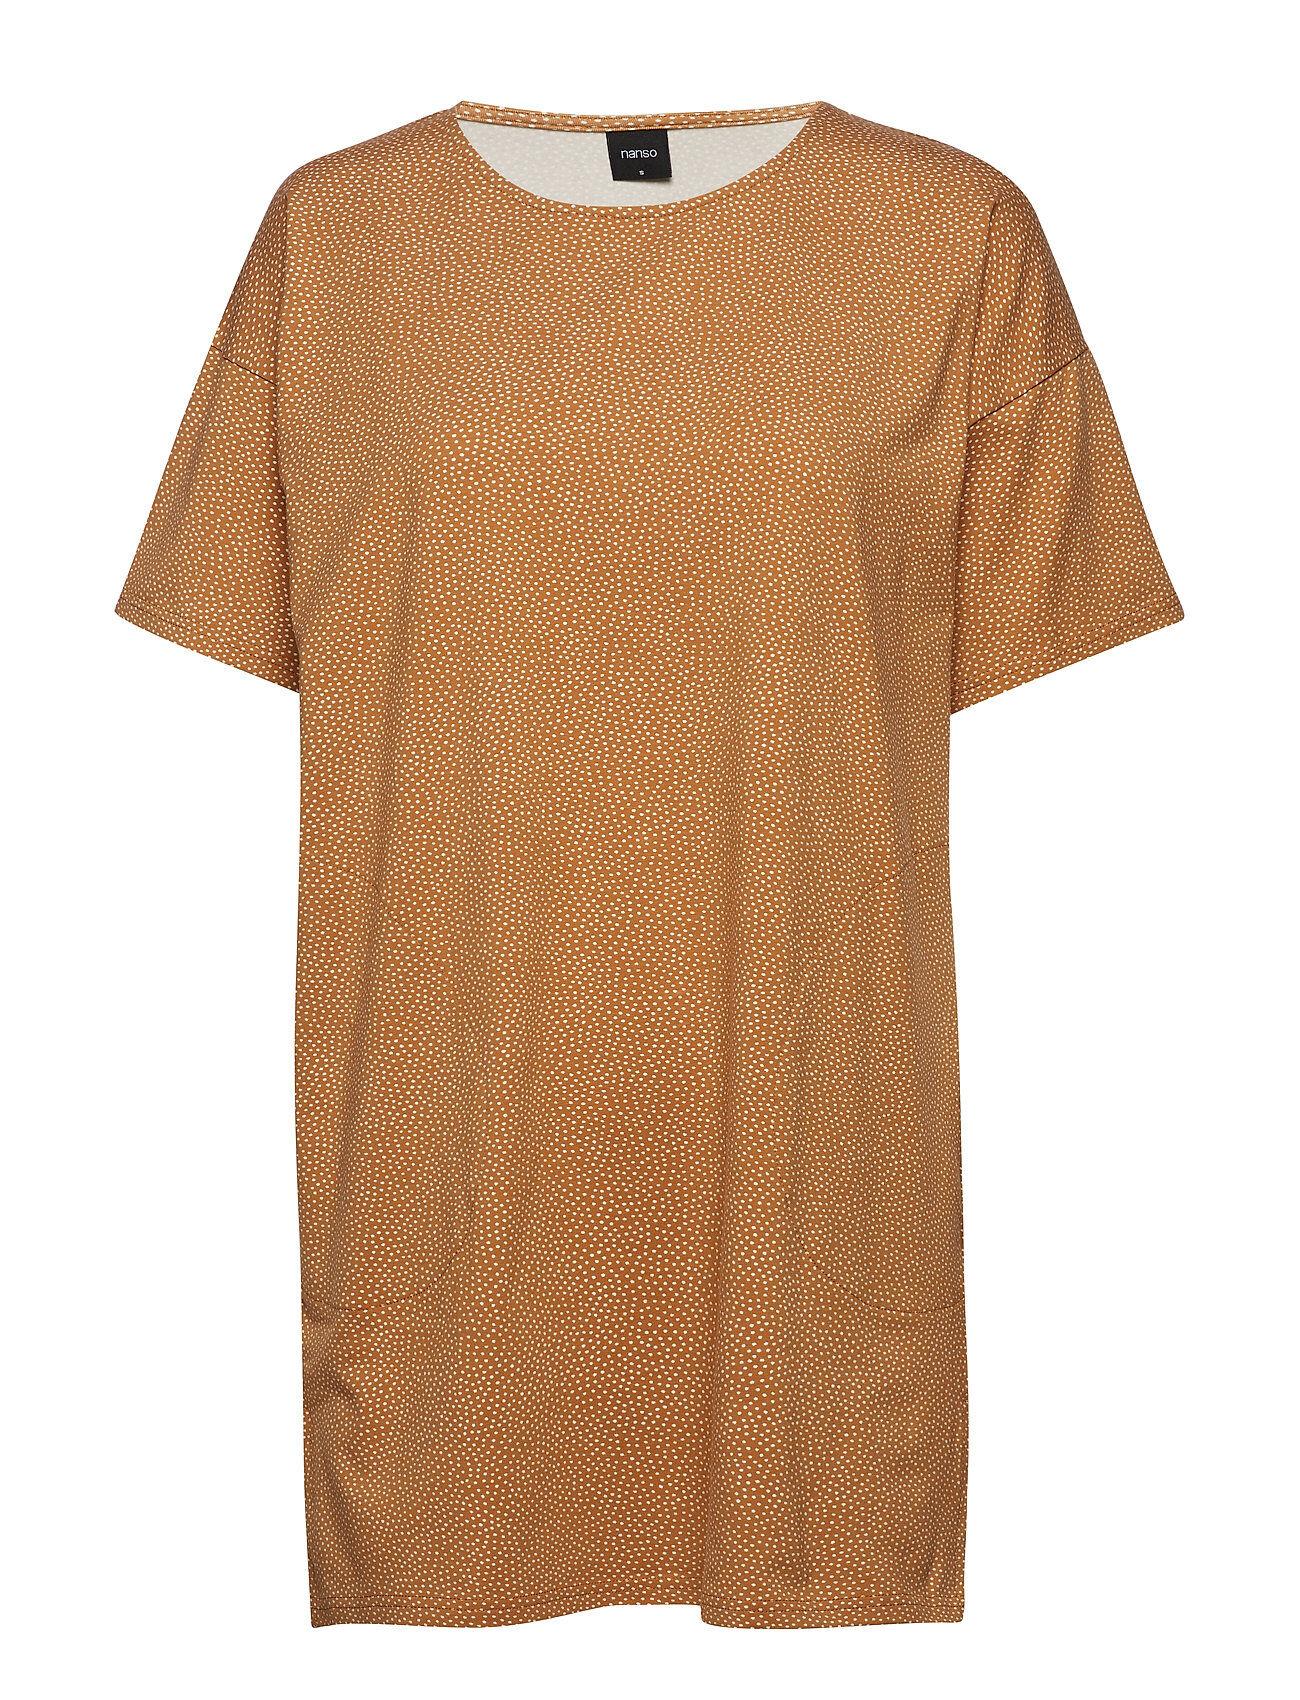 Nanso Ladies Leisure Wear/ Tunic, Pilkut